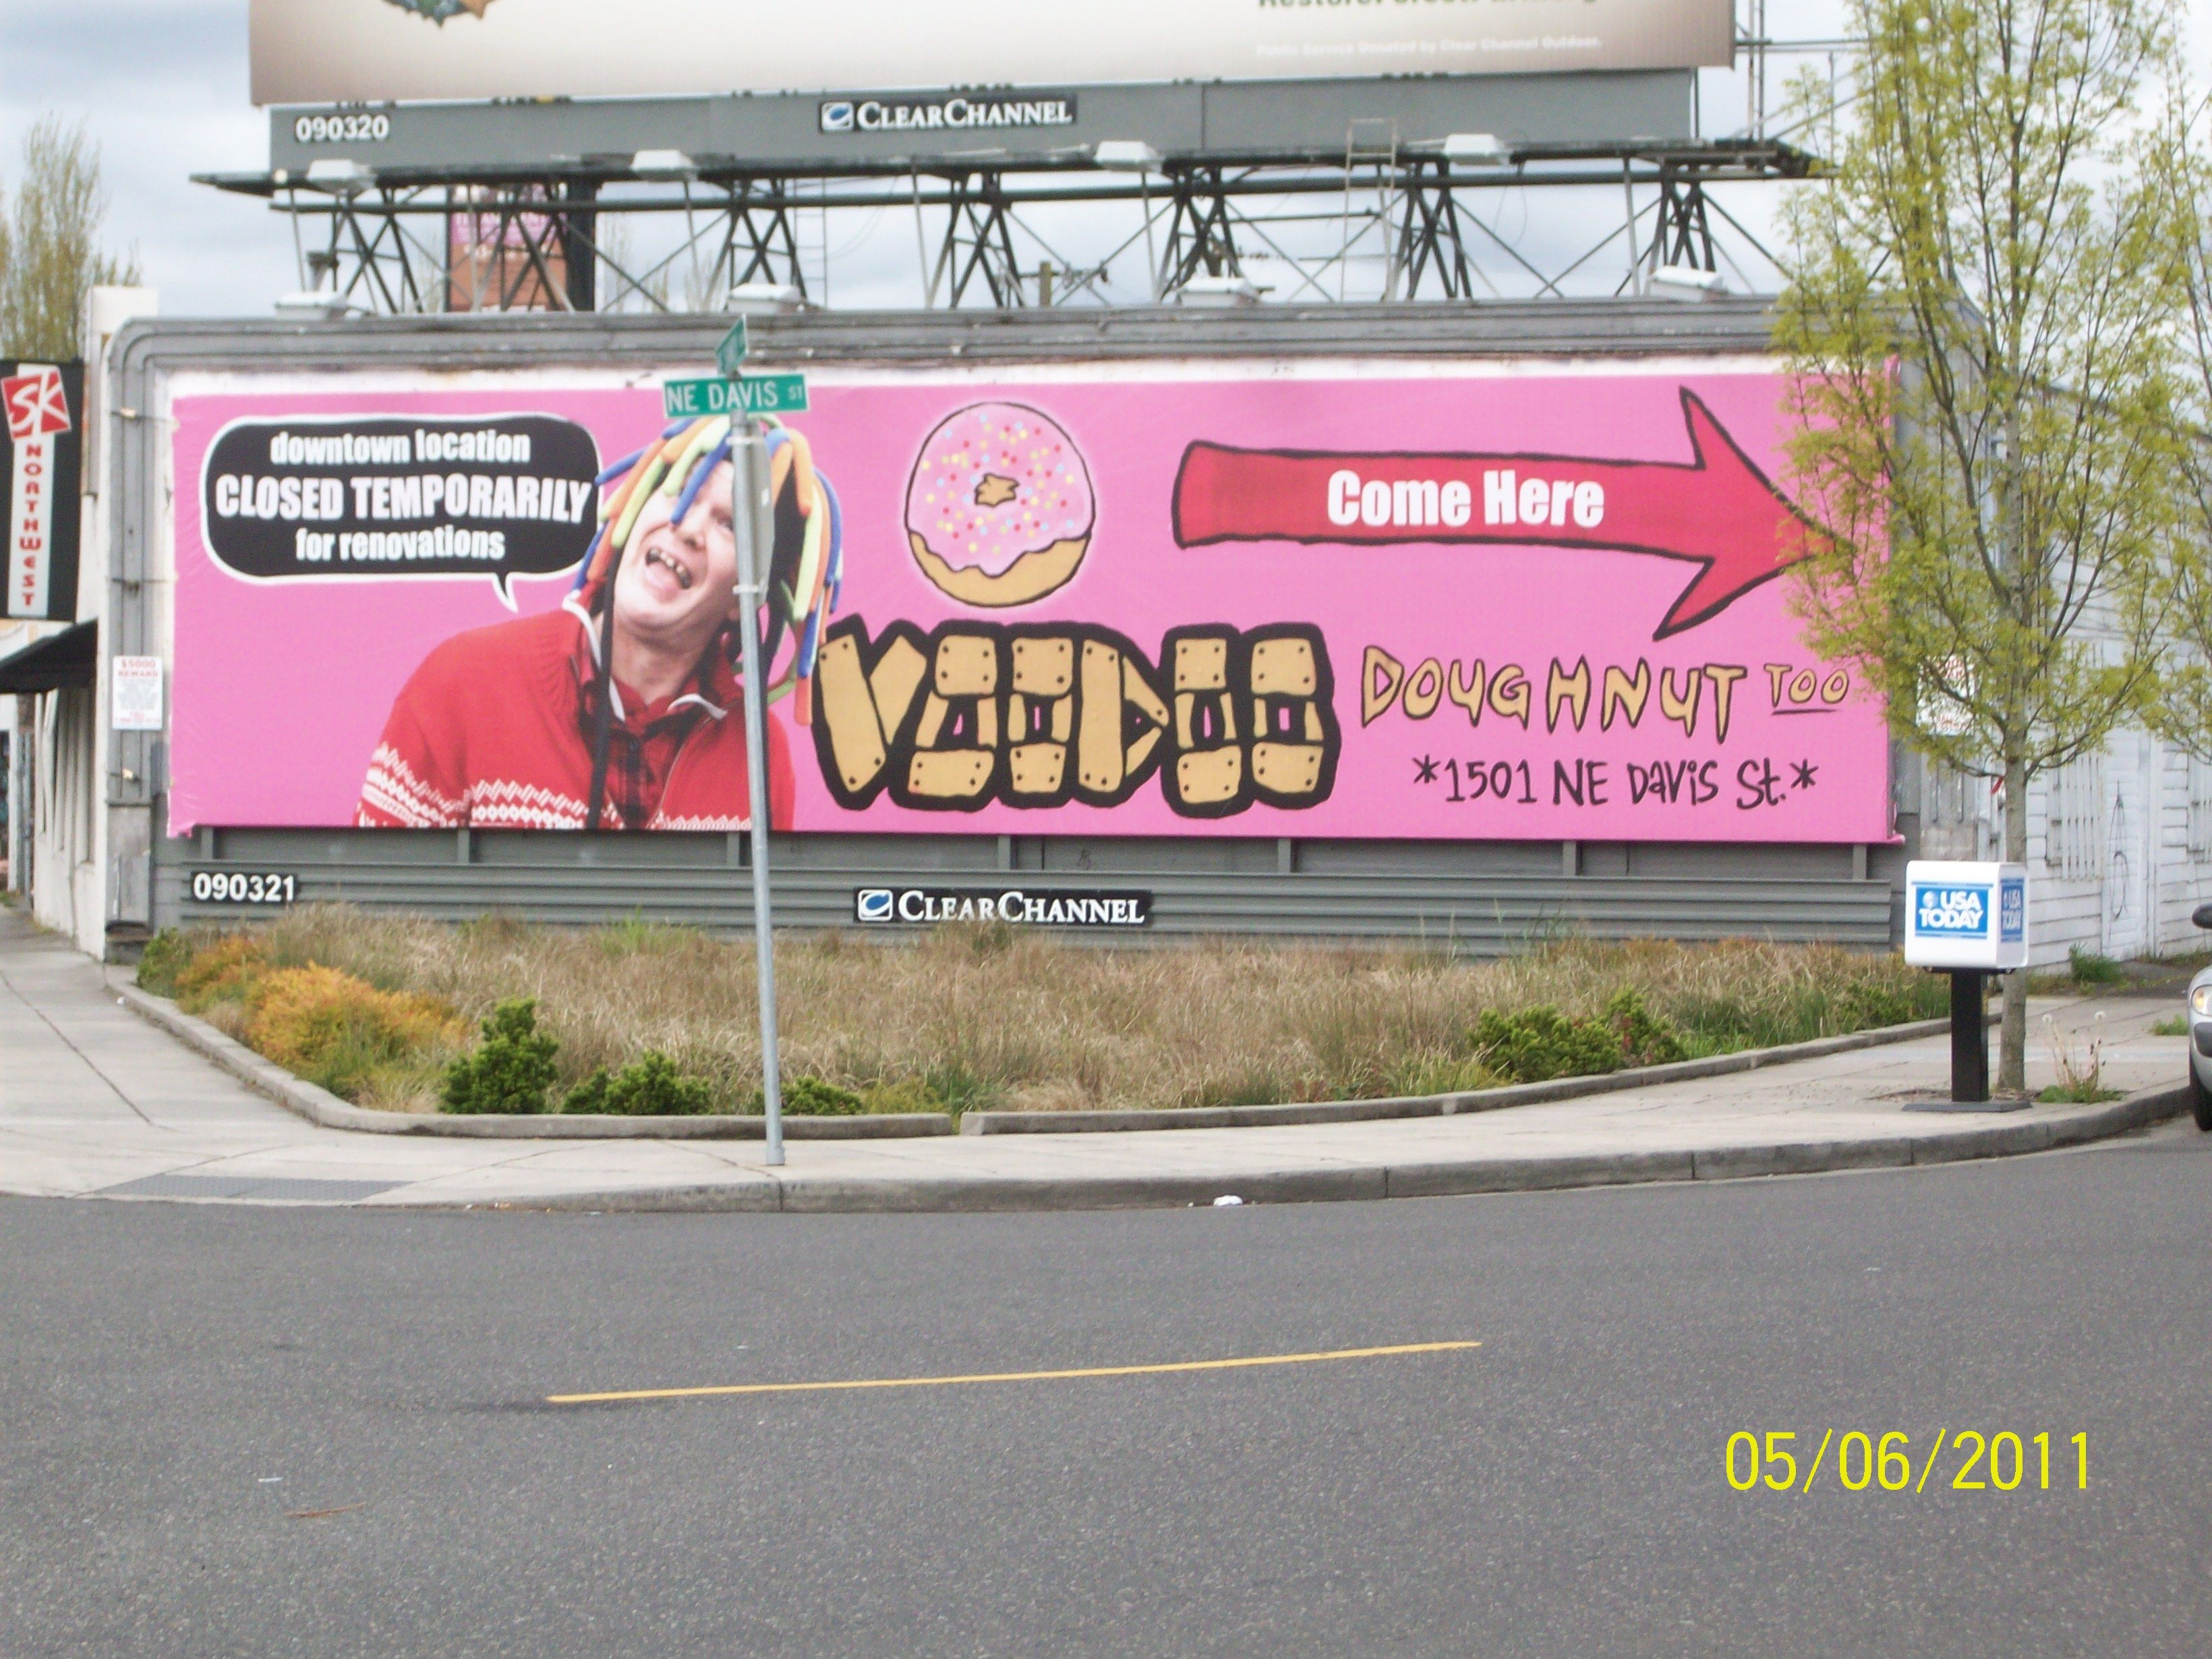 Voodoo Donuts, Portland, OR